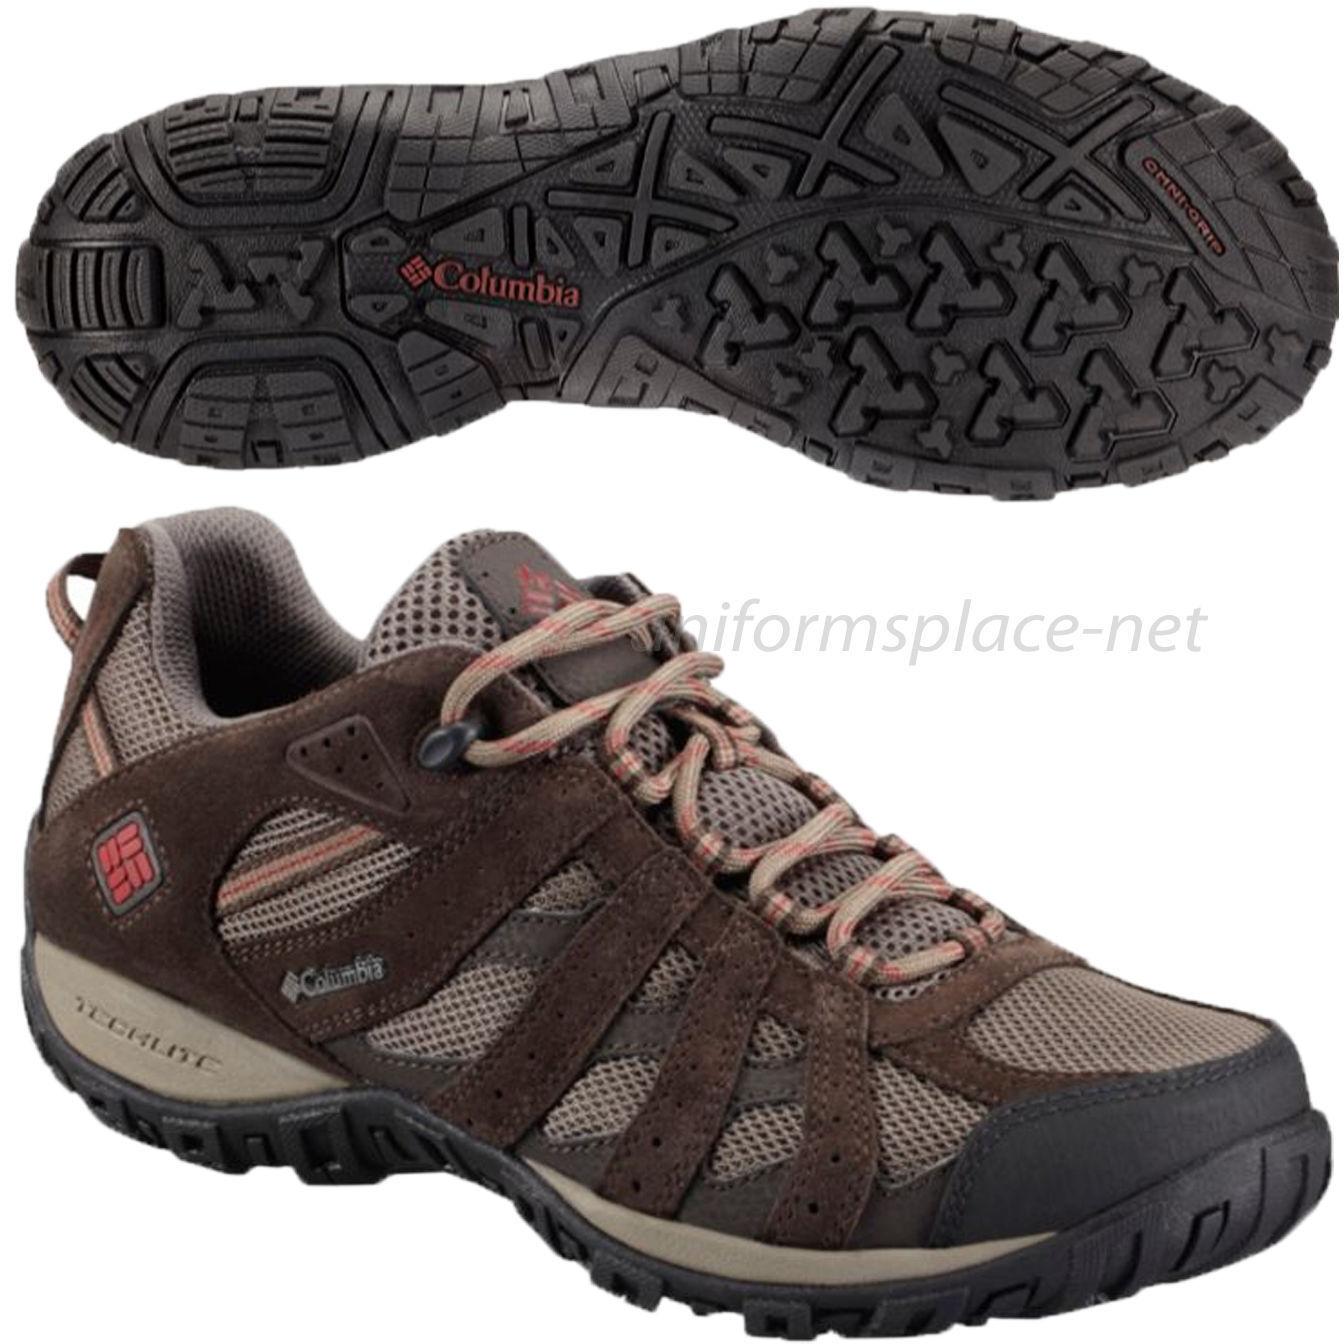 Columbia schuhe Mens rotmond Waterproof Mud Suede Leather Hiker Stiefel BM3938